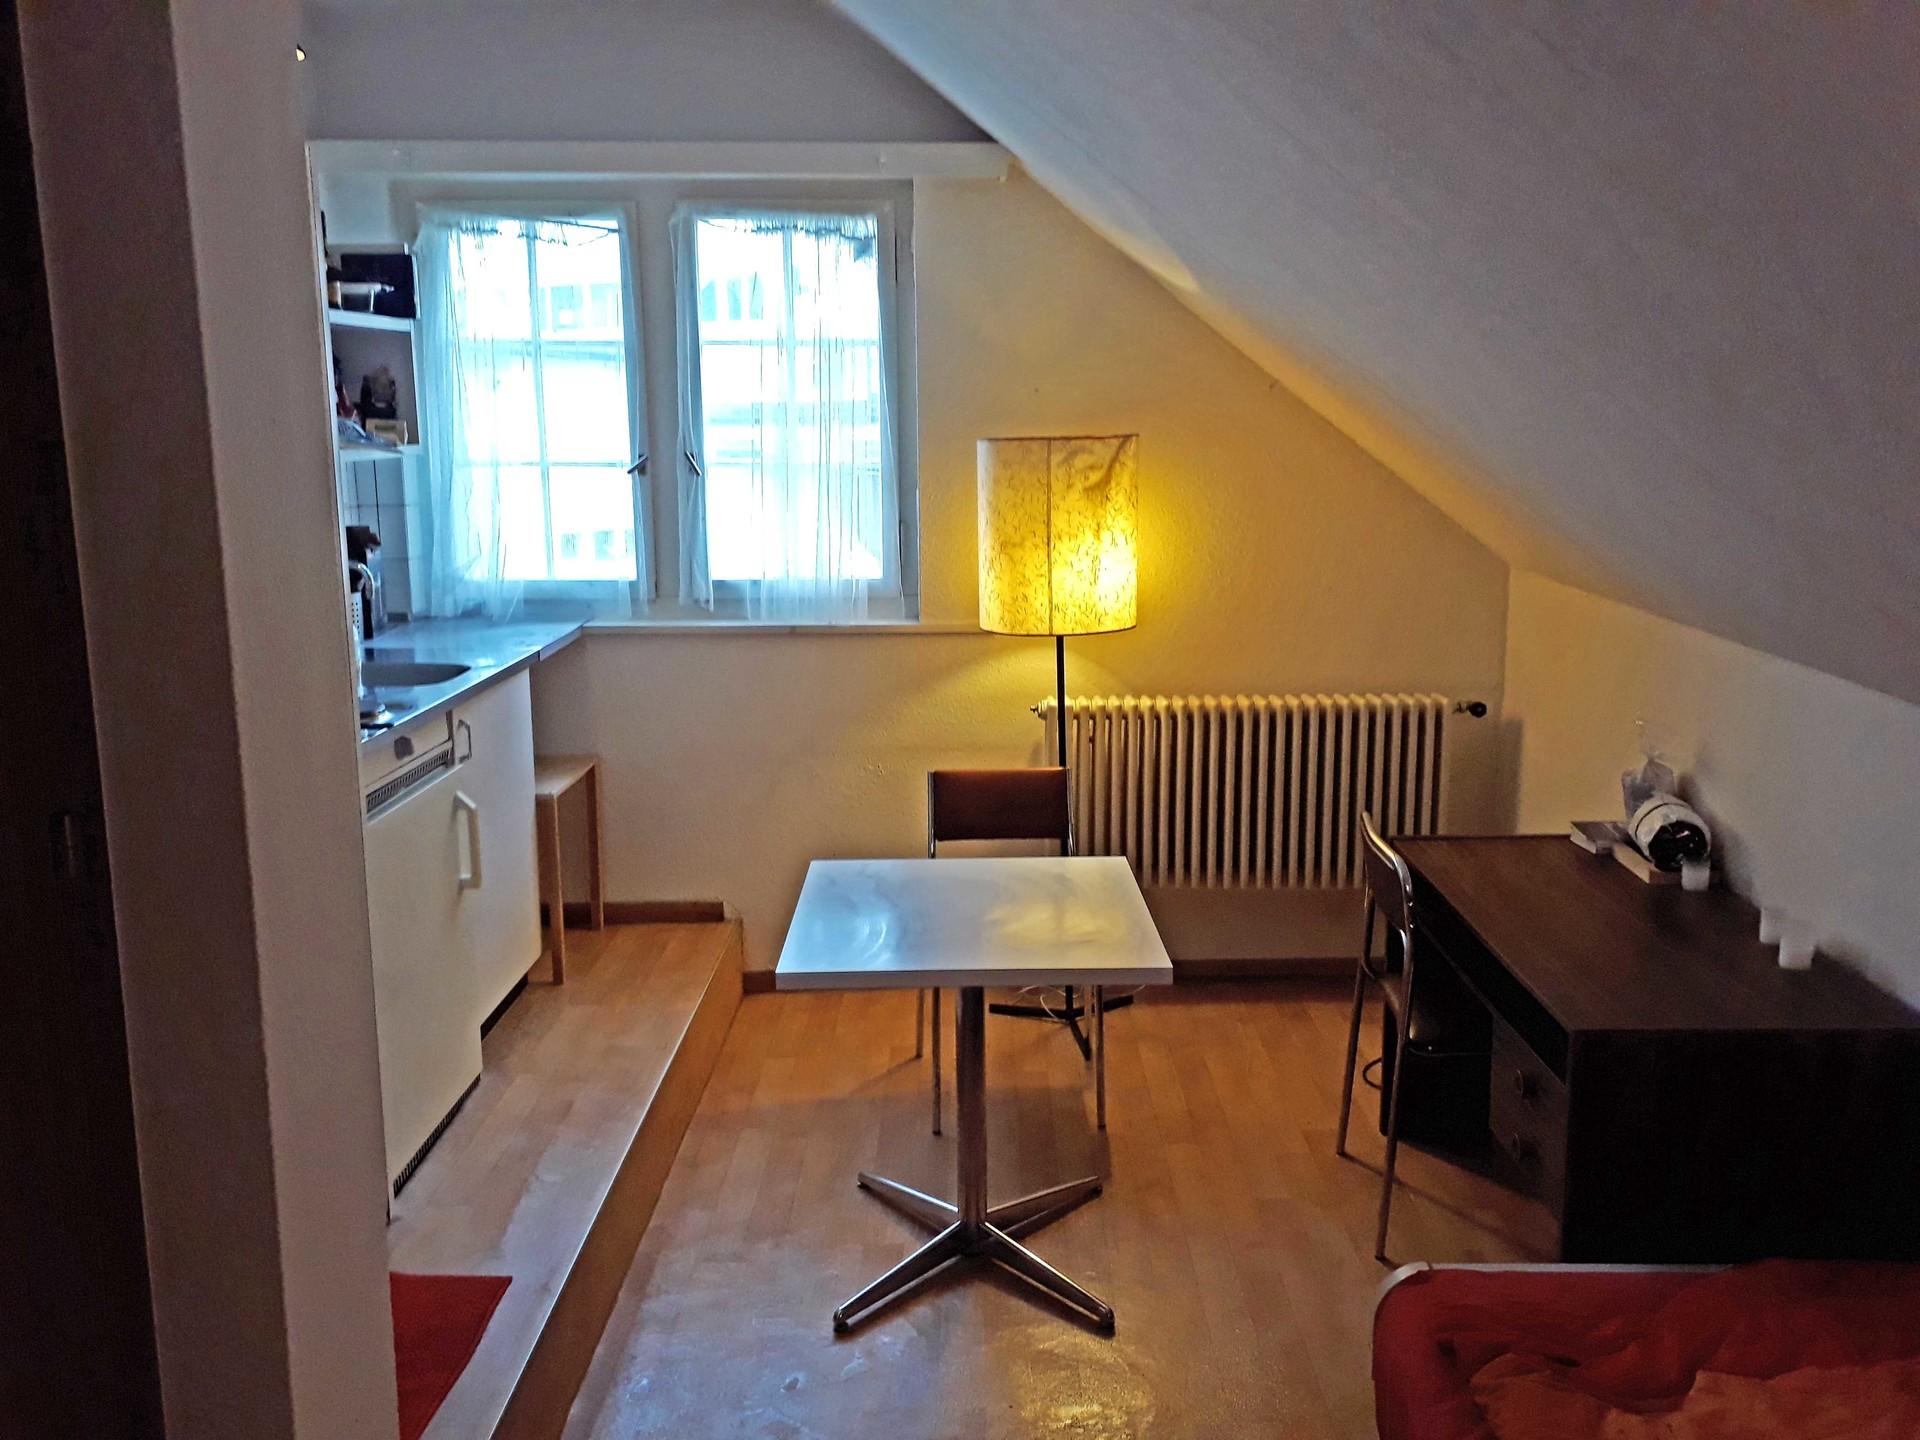 small-studio-5-minutes-ethuzh-1c36b060d2a42991c8ff2f5b6f288e2e